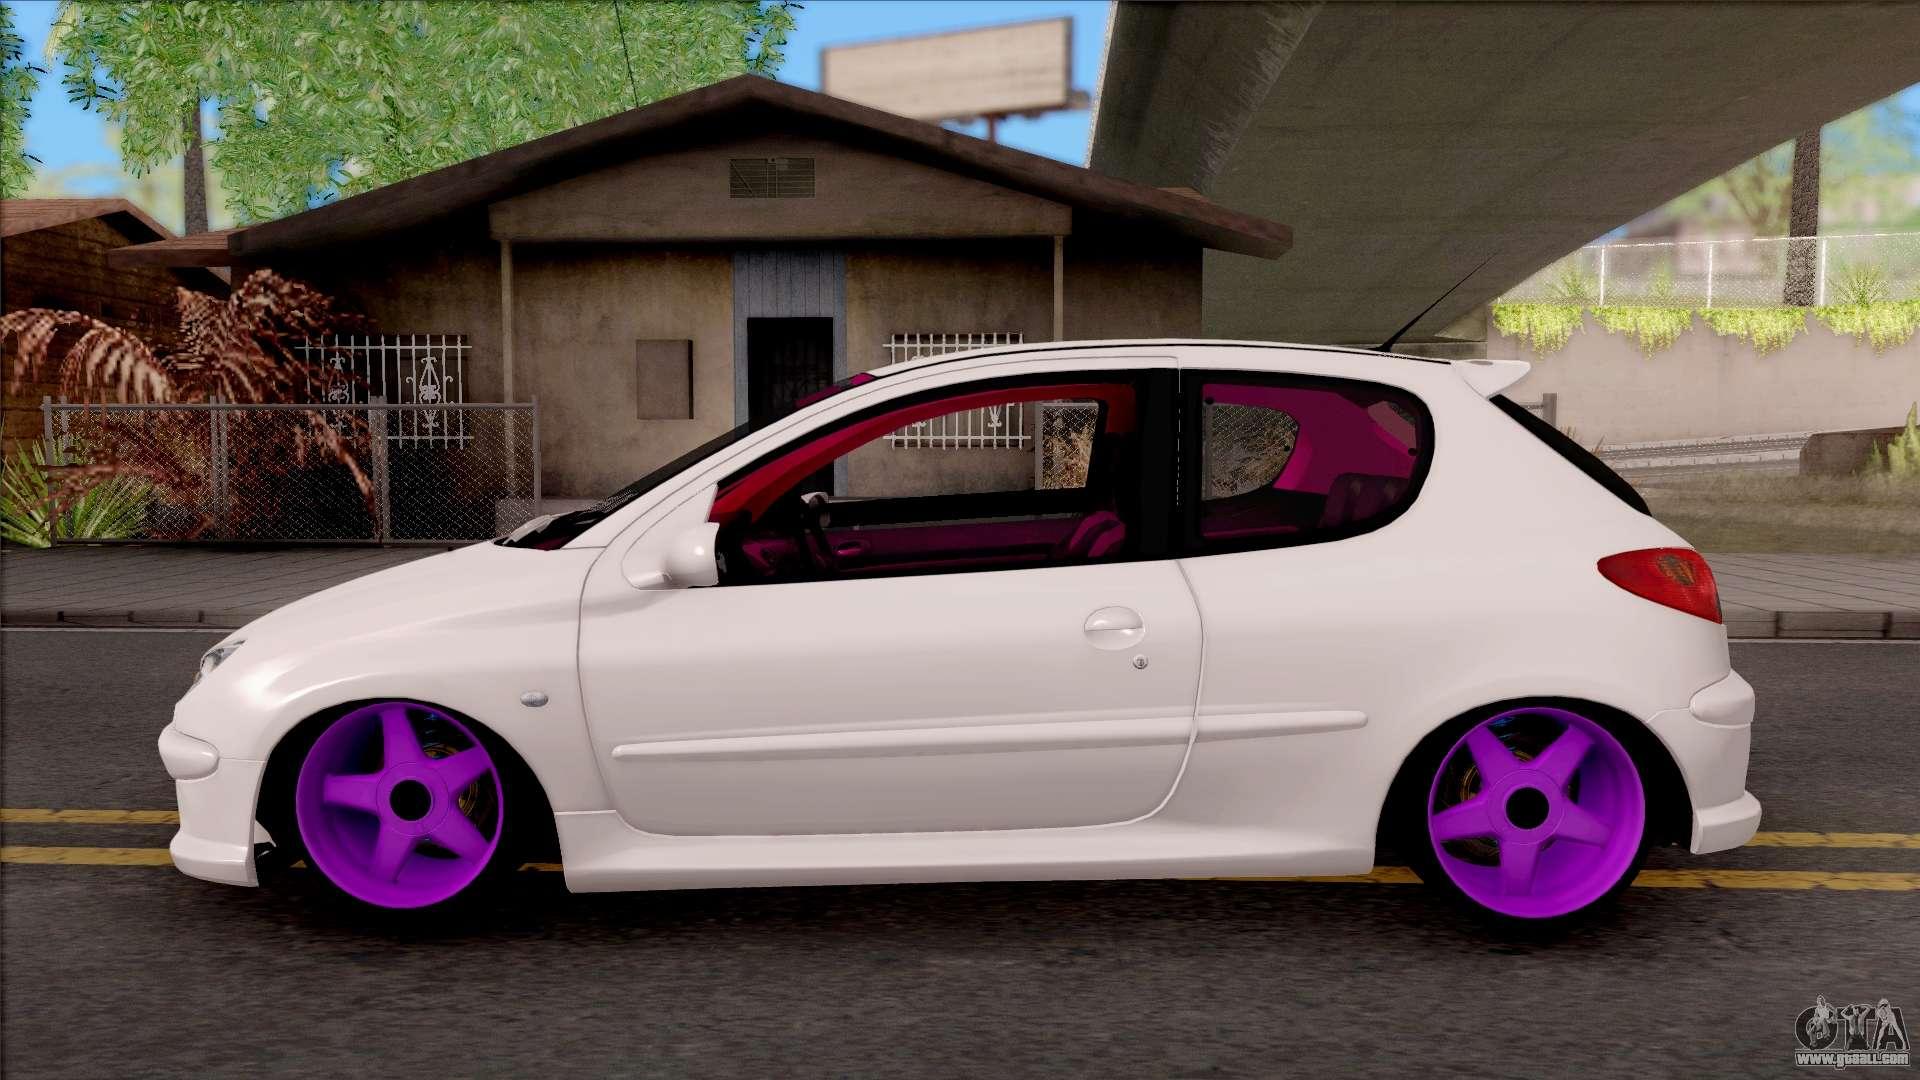 Gta 5 Peugeot 206 Mod - EpicGaming